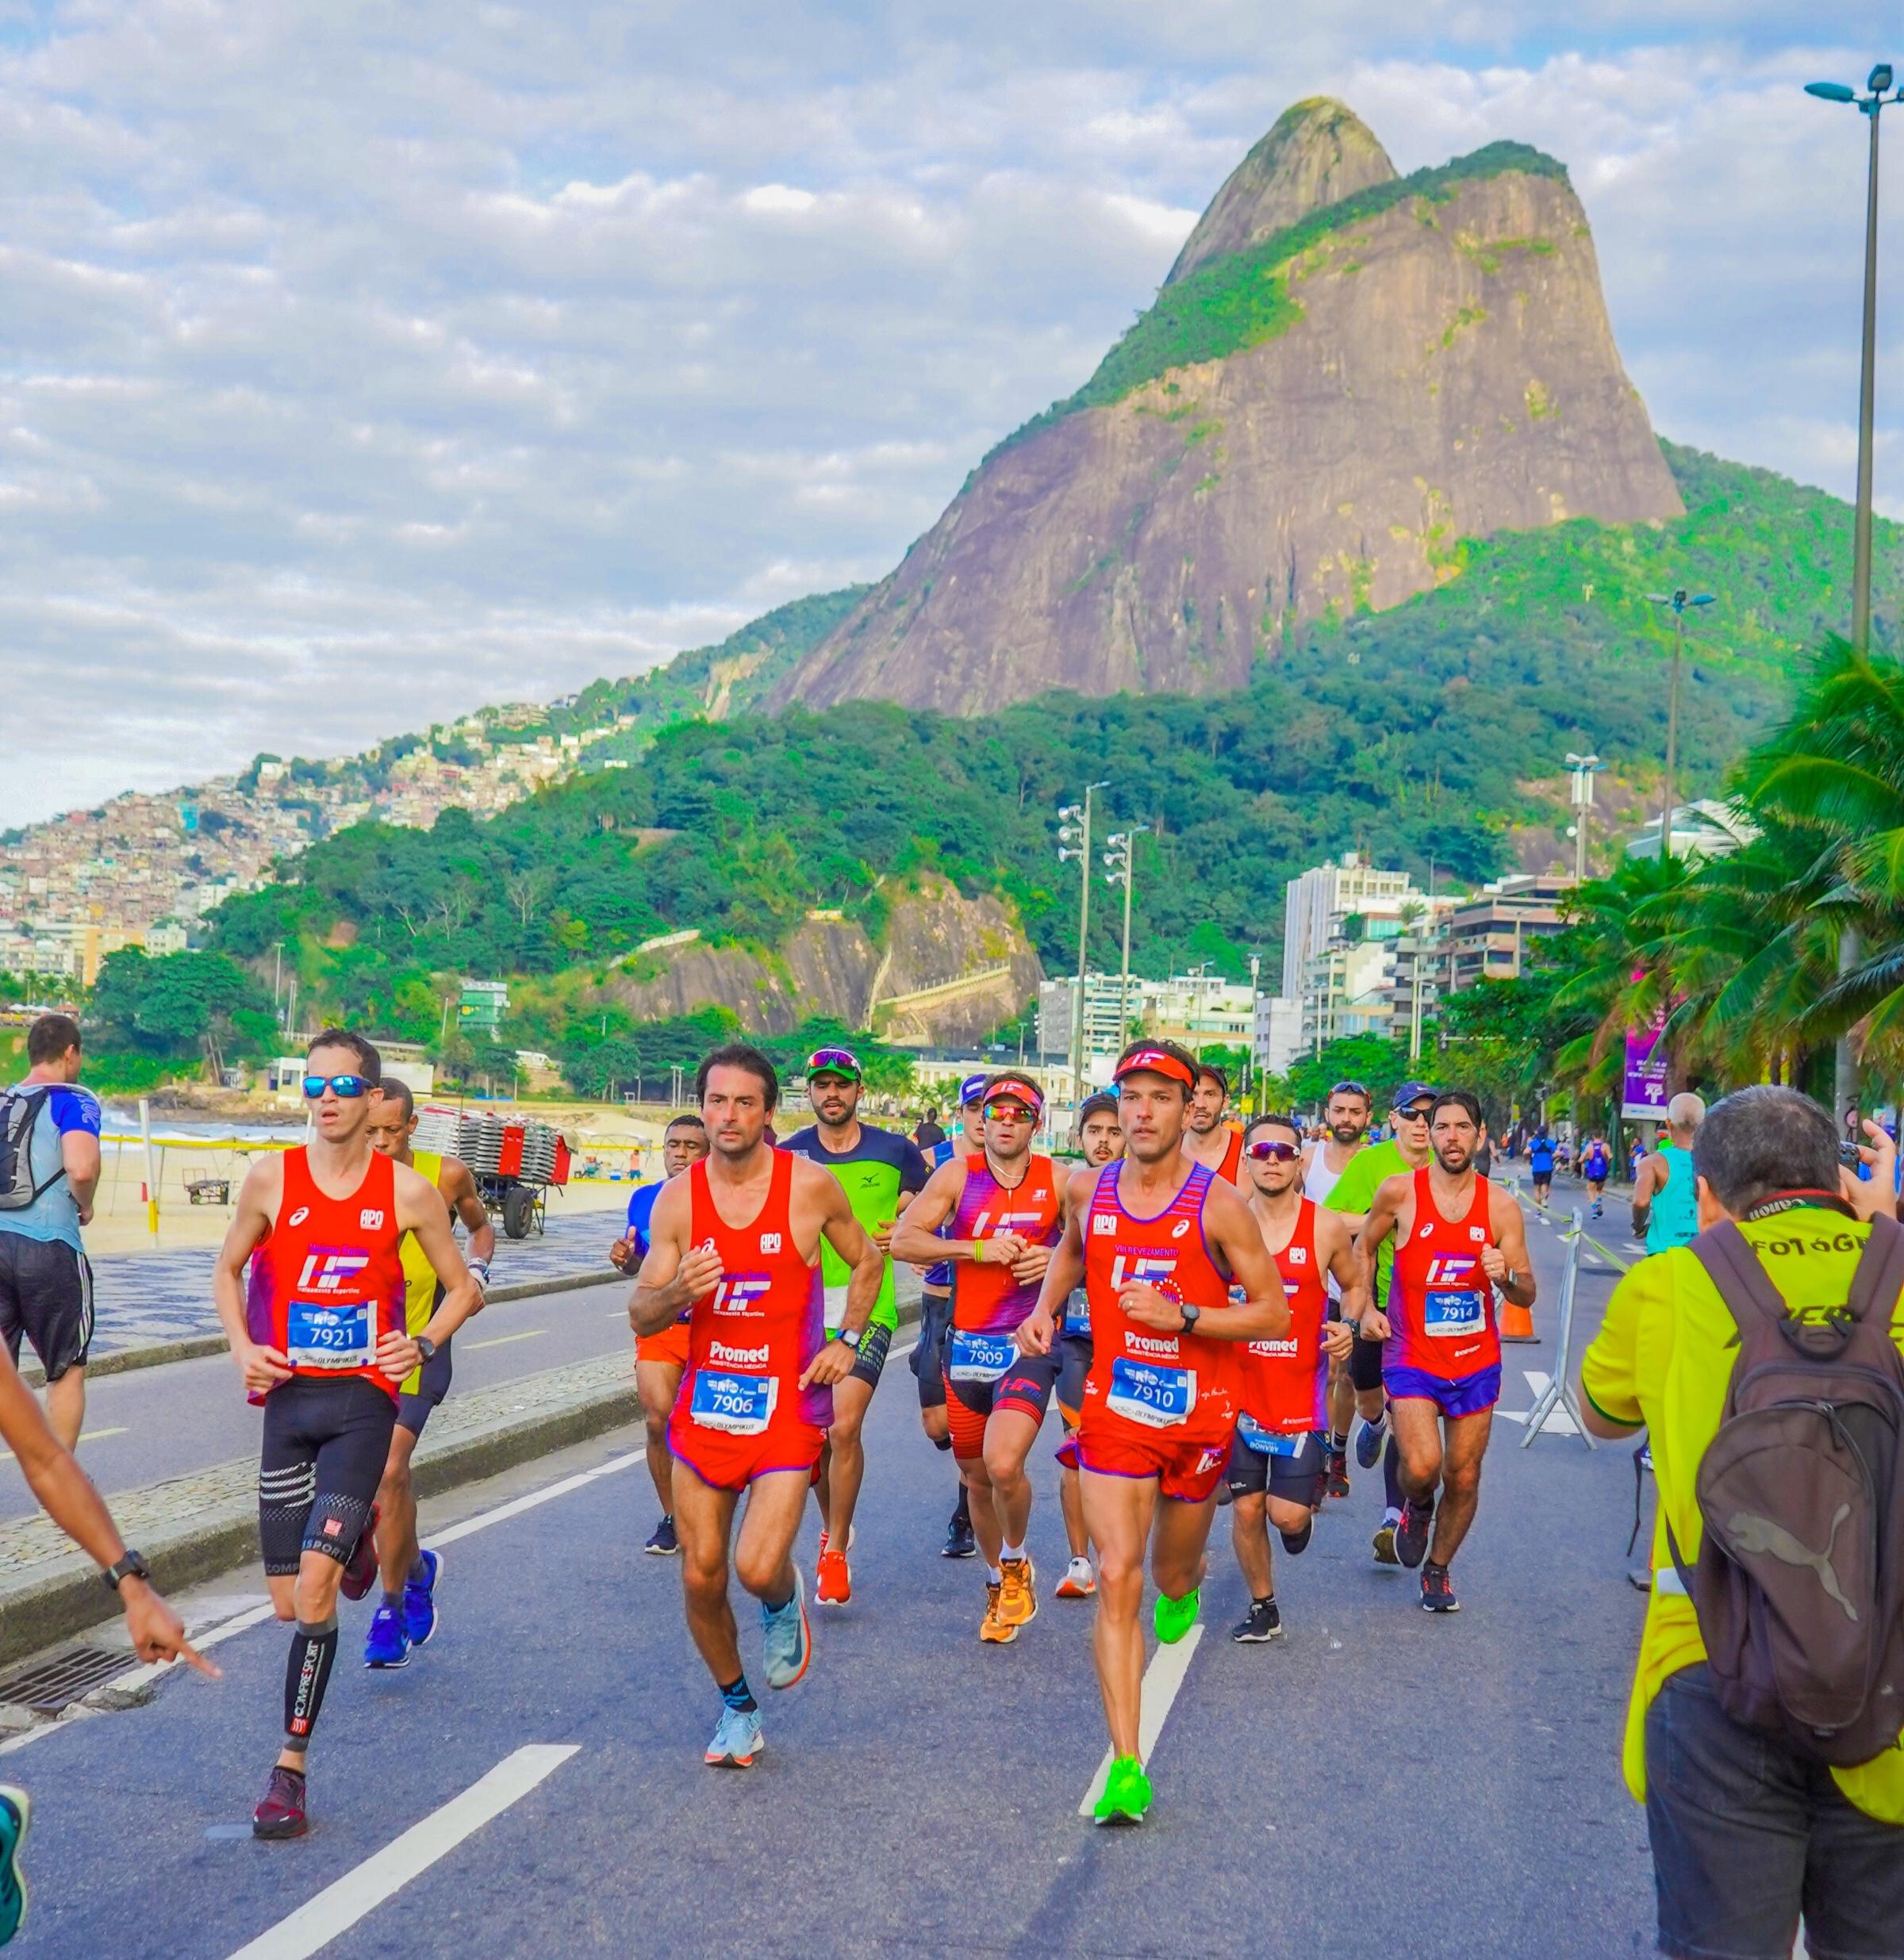 Maratona do Rio: espírito de equipe e resiliência